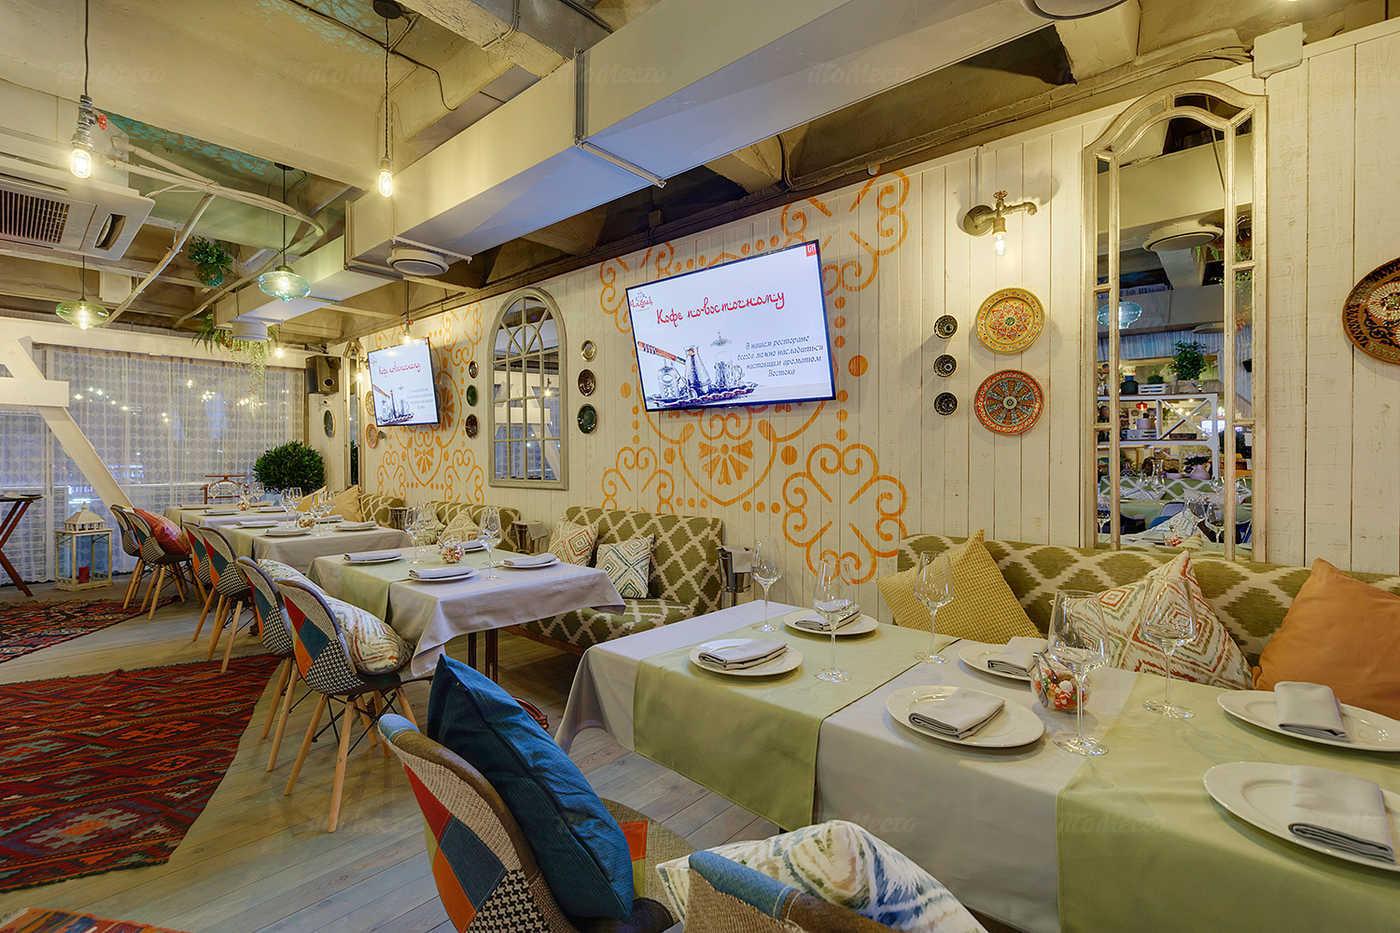 Ресторан Чайхана Чабрец на Аптекарской набережной